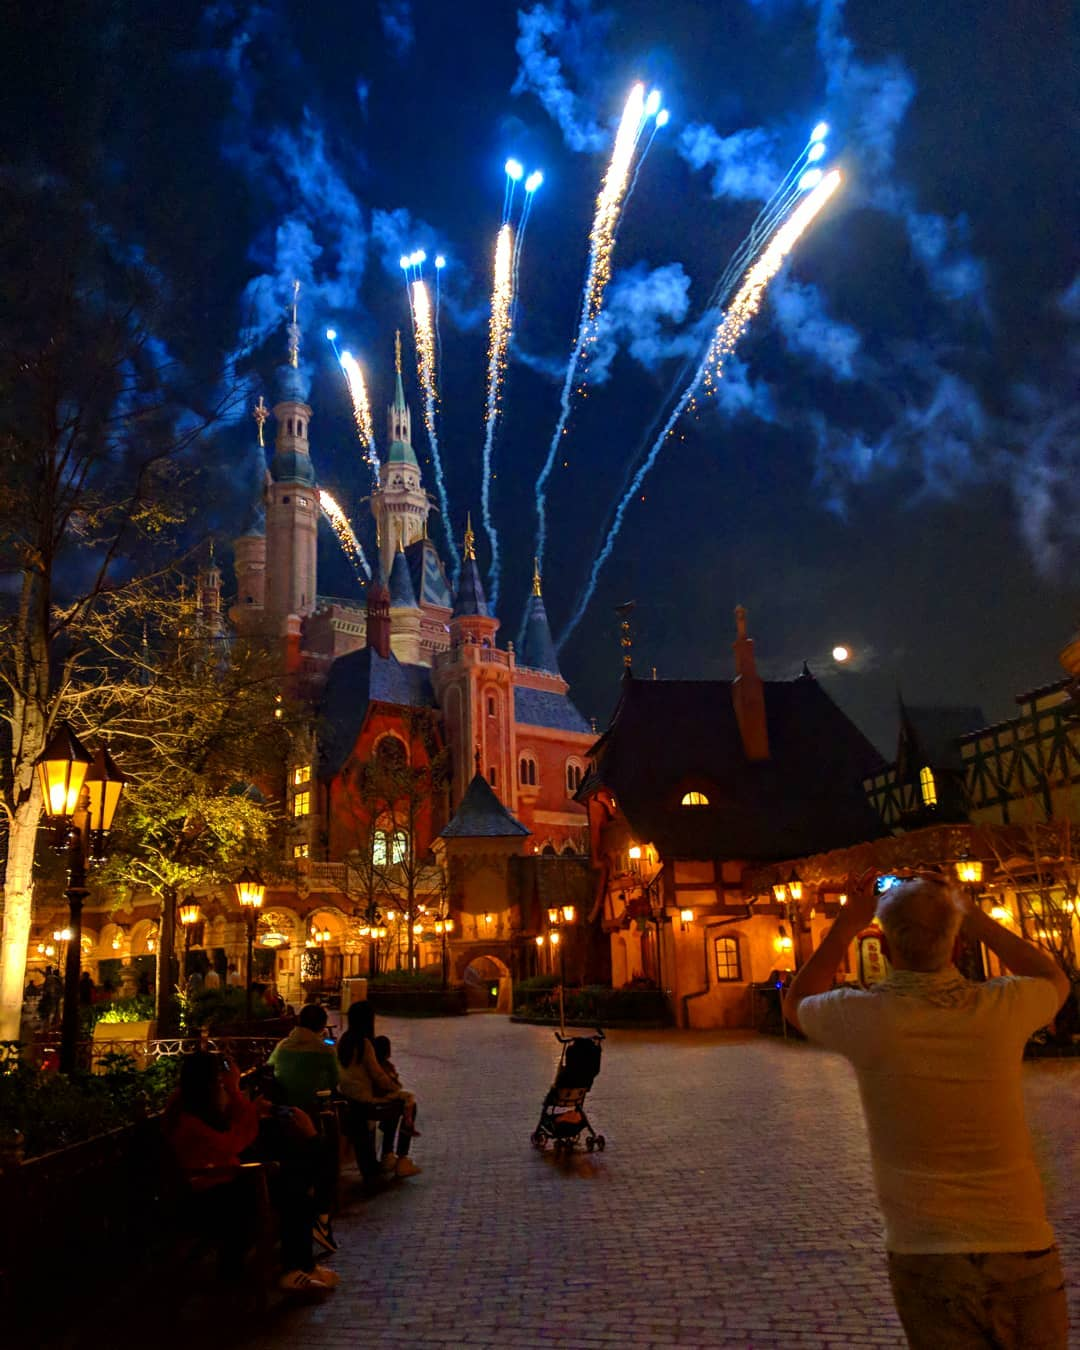 2. Fireworks -